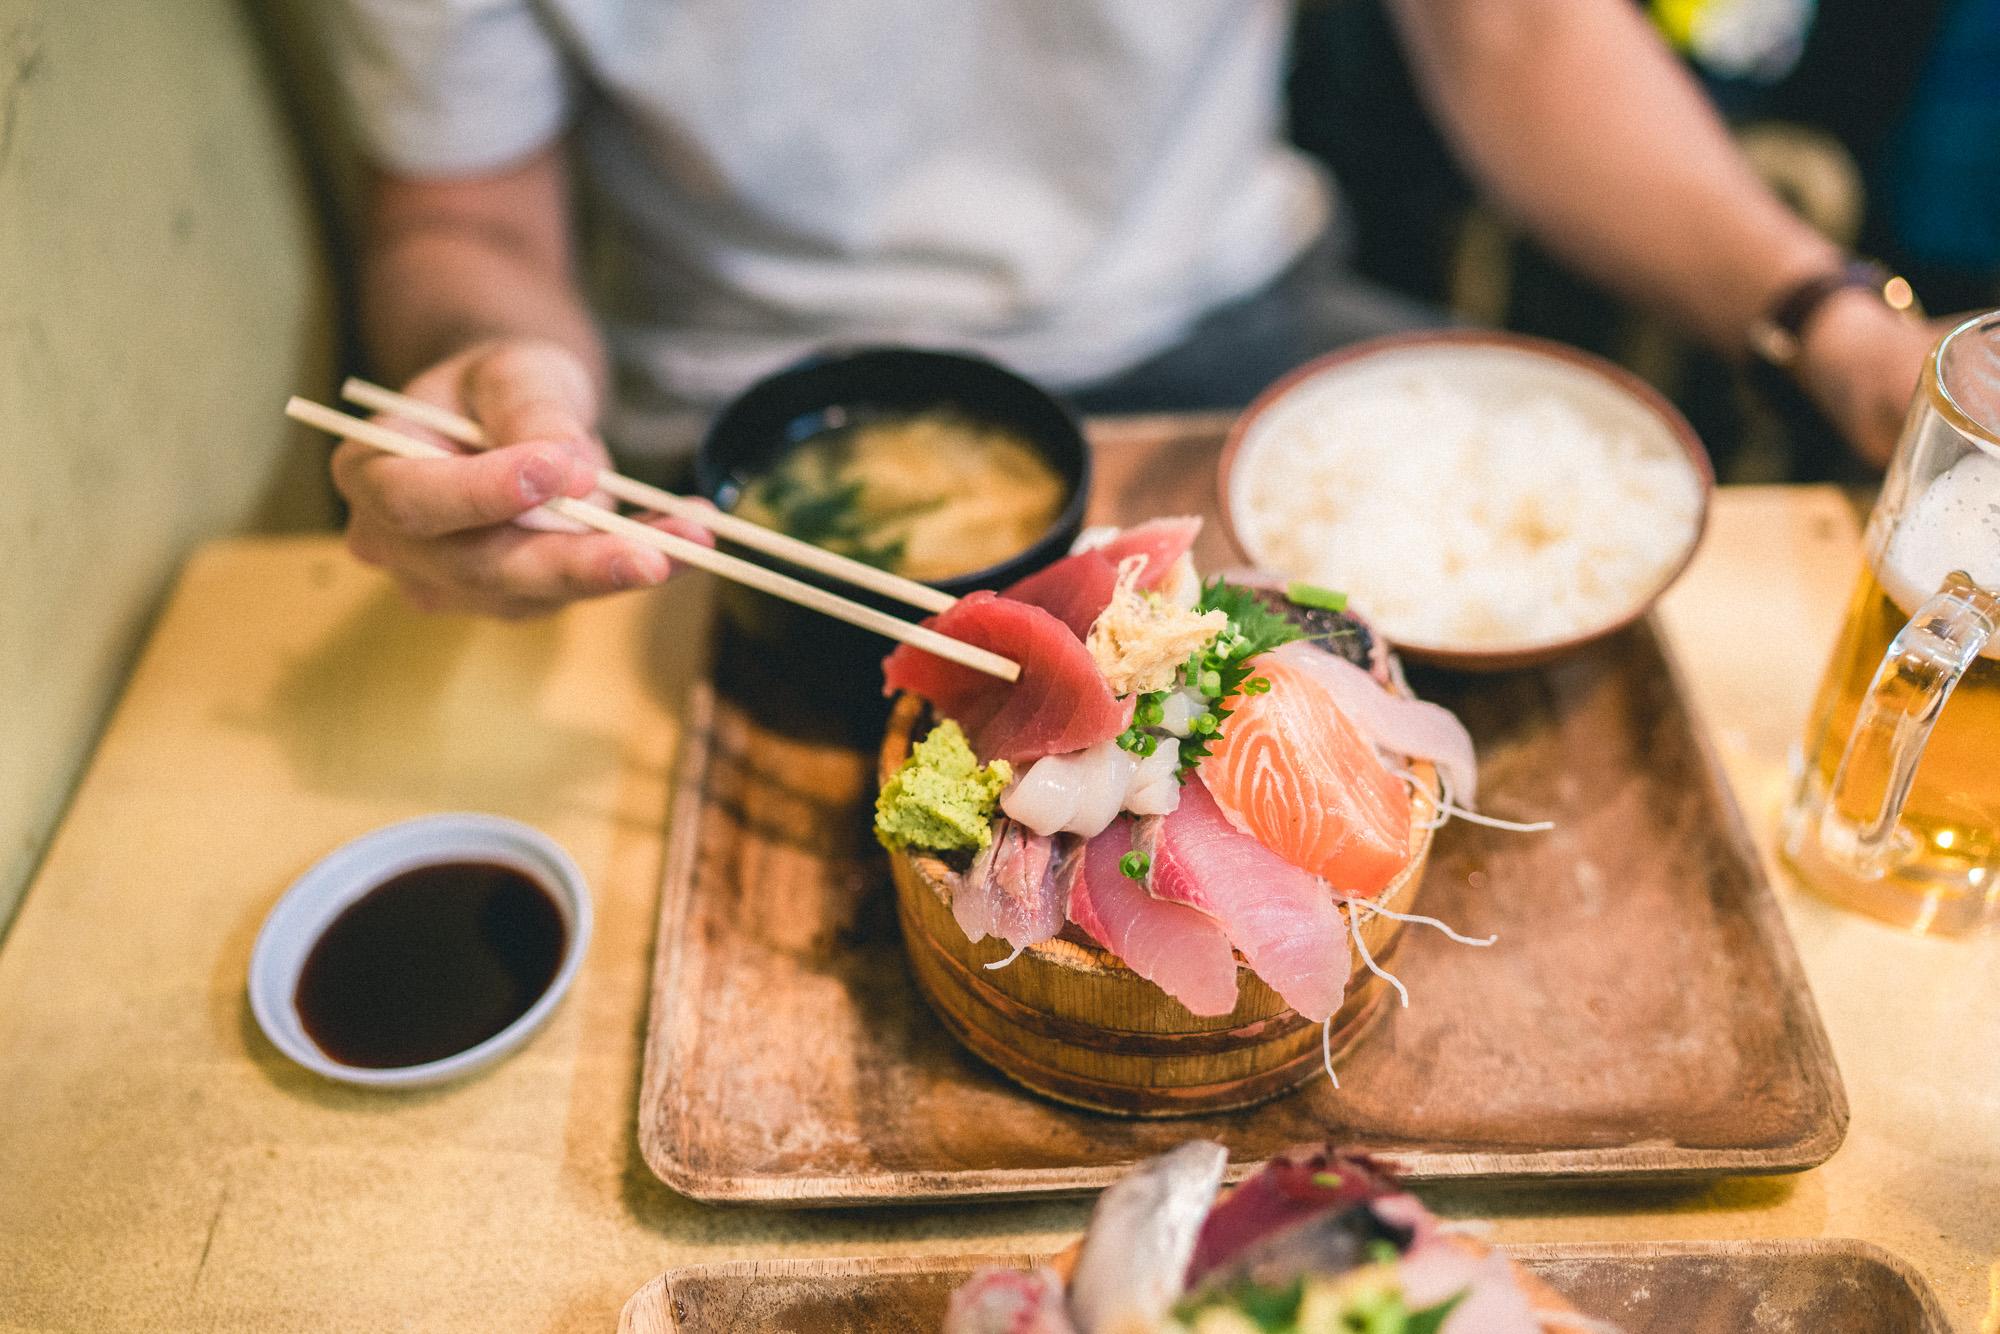 The Complete Tokyo Travel Guide | City Guides | Japan Travel Itinerary | Shinjuku Shibuya Harujuku Neighborhood Travel Tips | Chirashi Sushi Dinner Cheap Eats